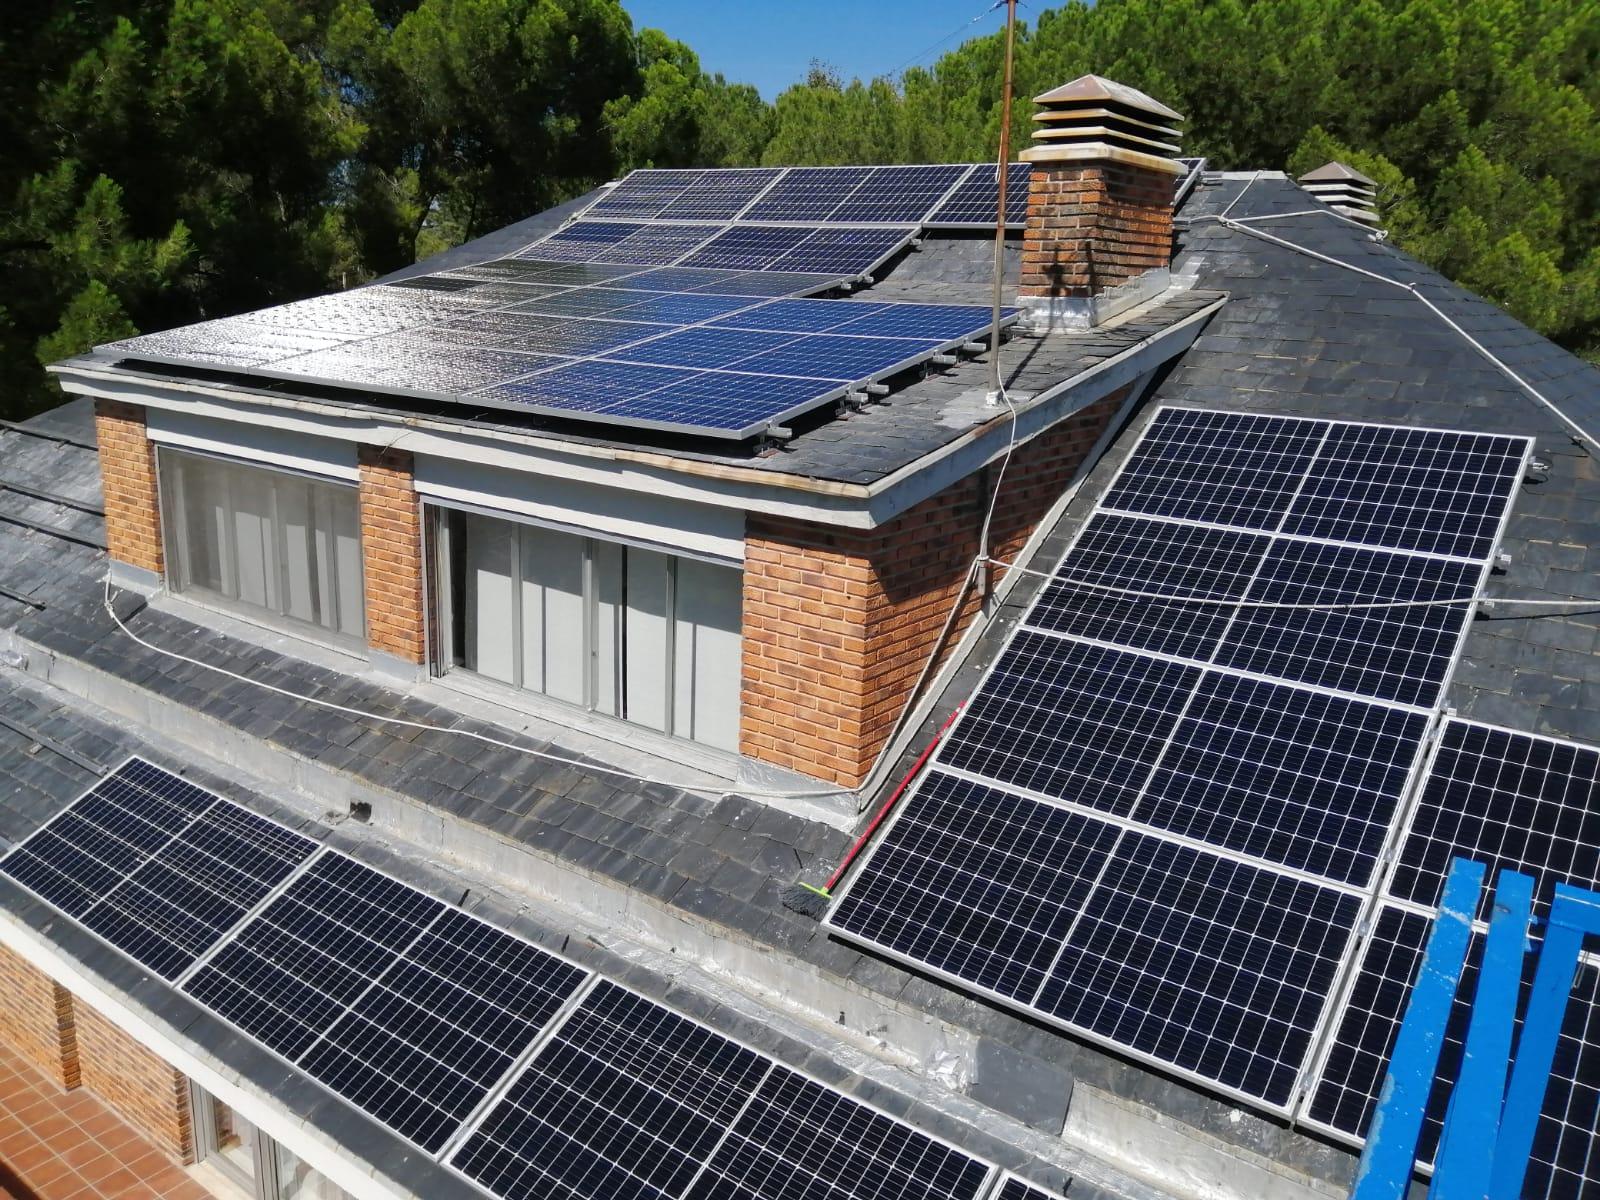 Fotovoltaica en vivienda